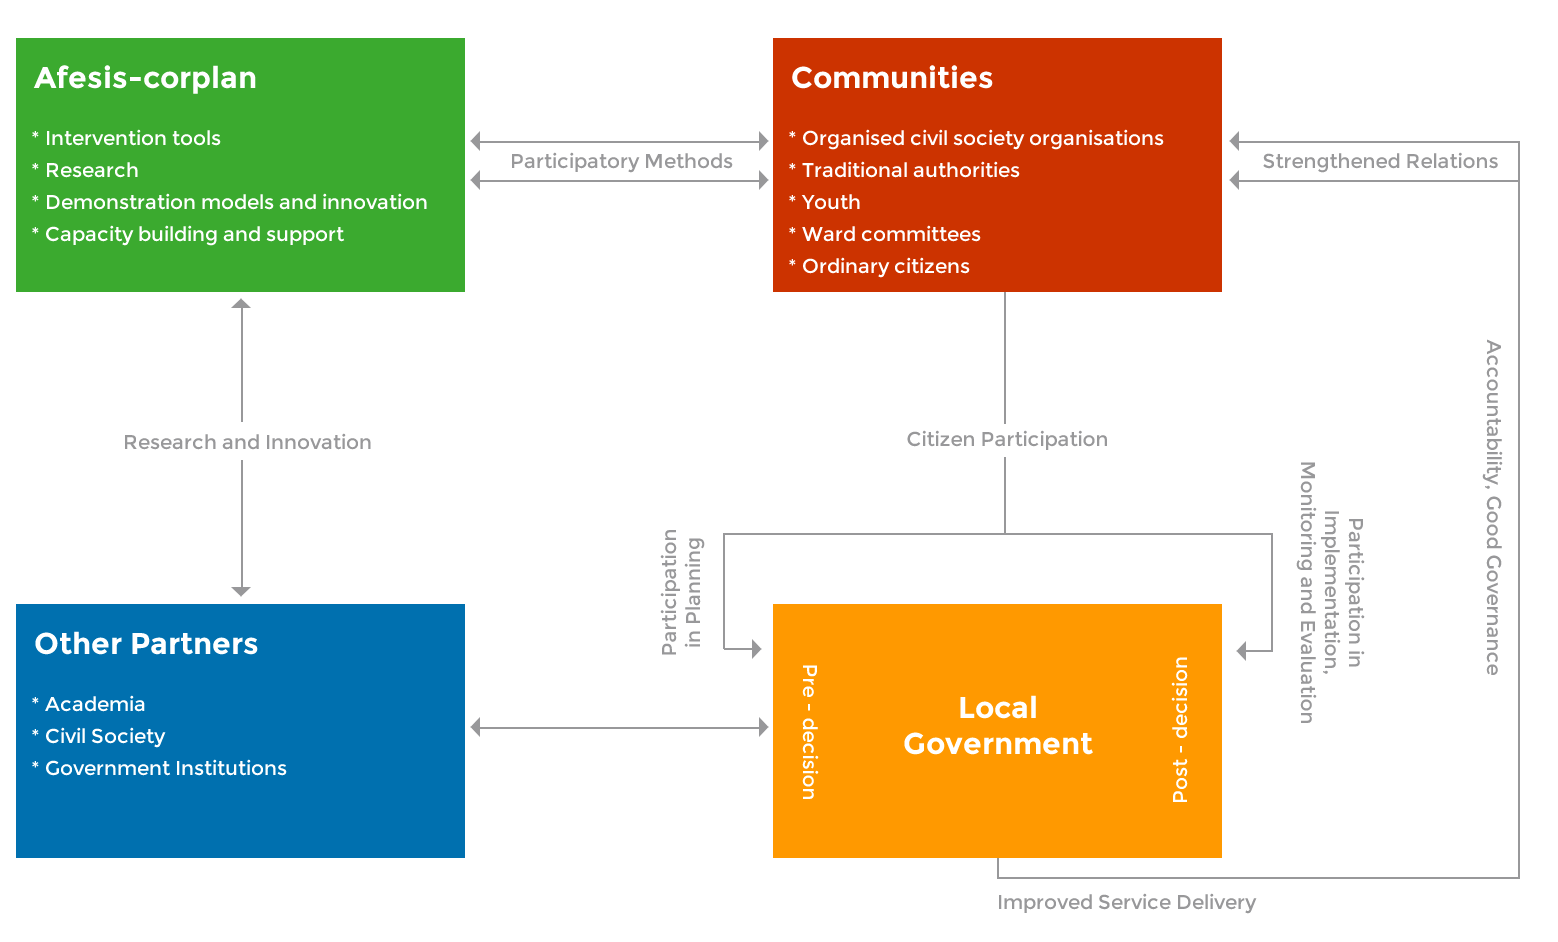 afesis-corplan active citizenship and good governance